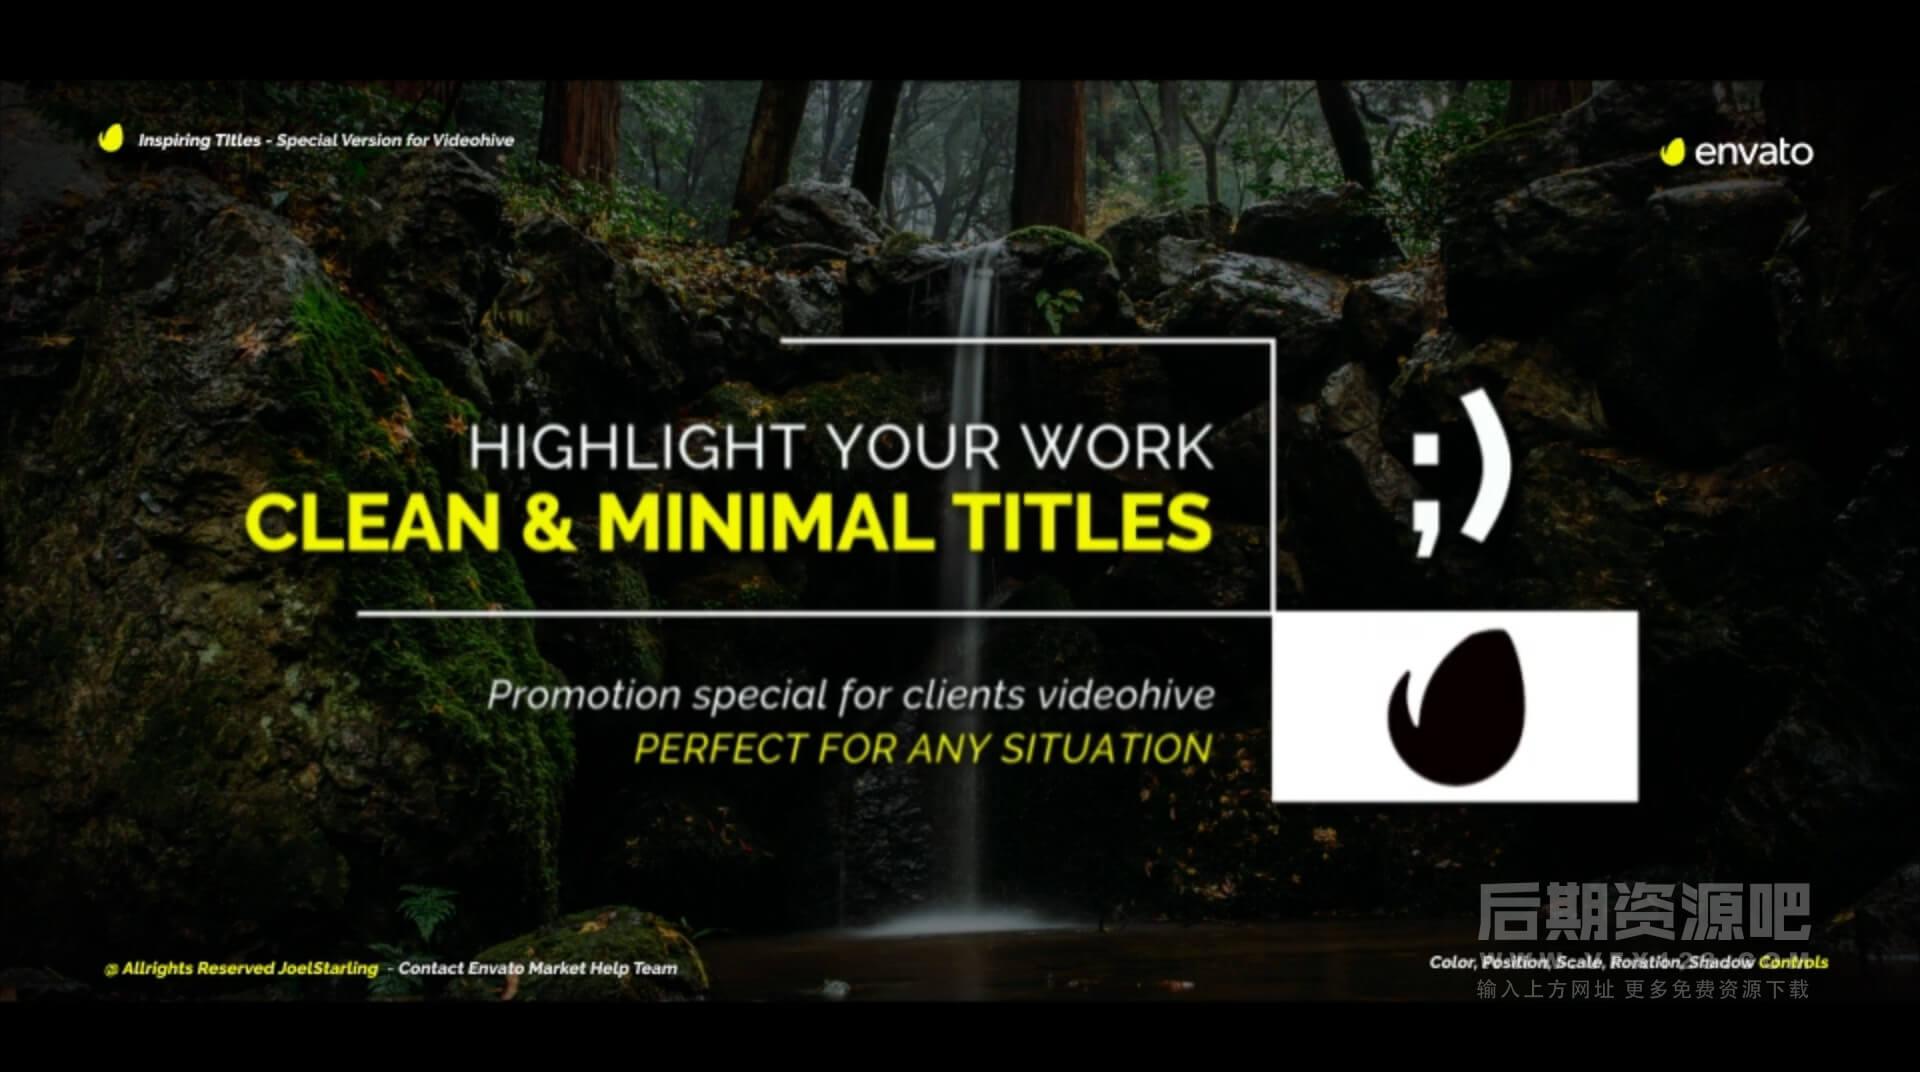 Fcpx标题插件 20组干净优雅字幕条排版动画模板 Inspiring Titles